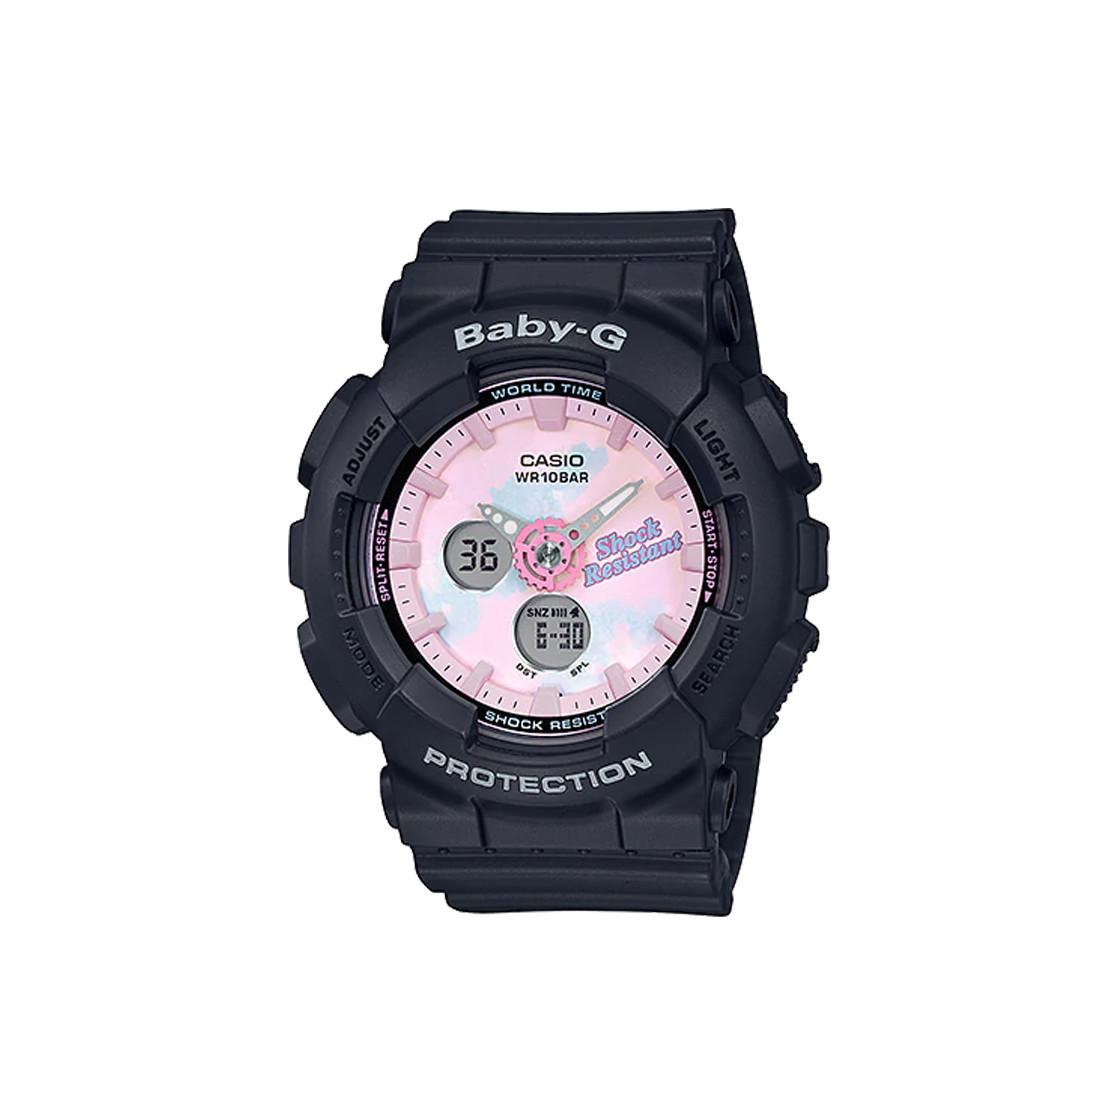 Đồng hồ Casio Nữ Baby G BA-120T, BA-120TG